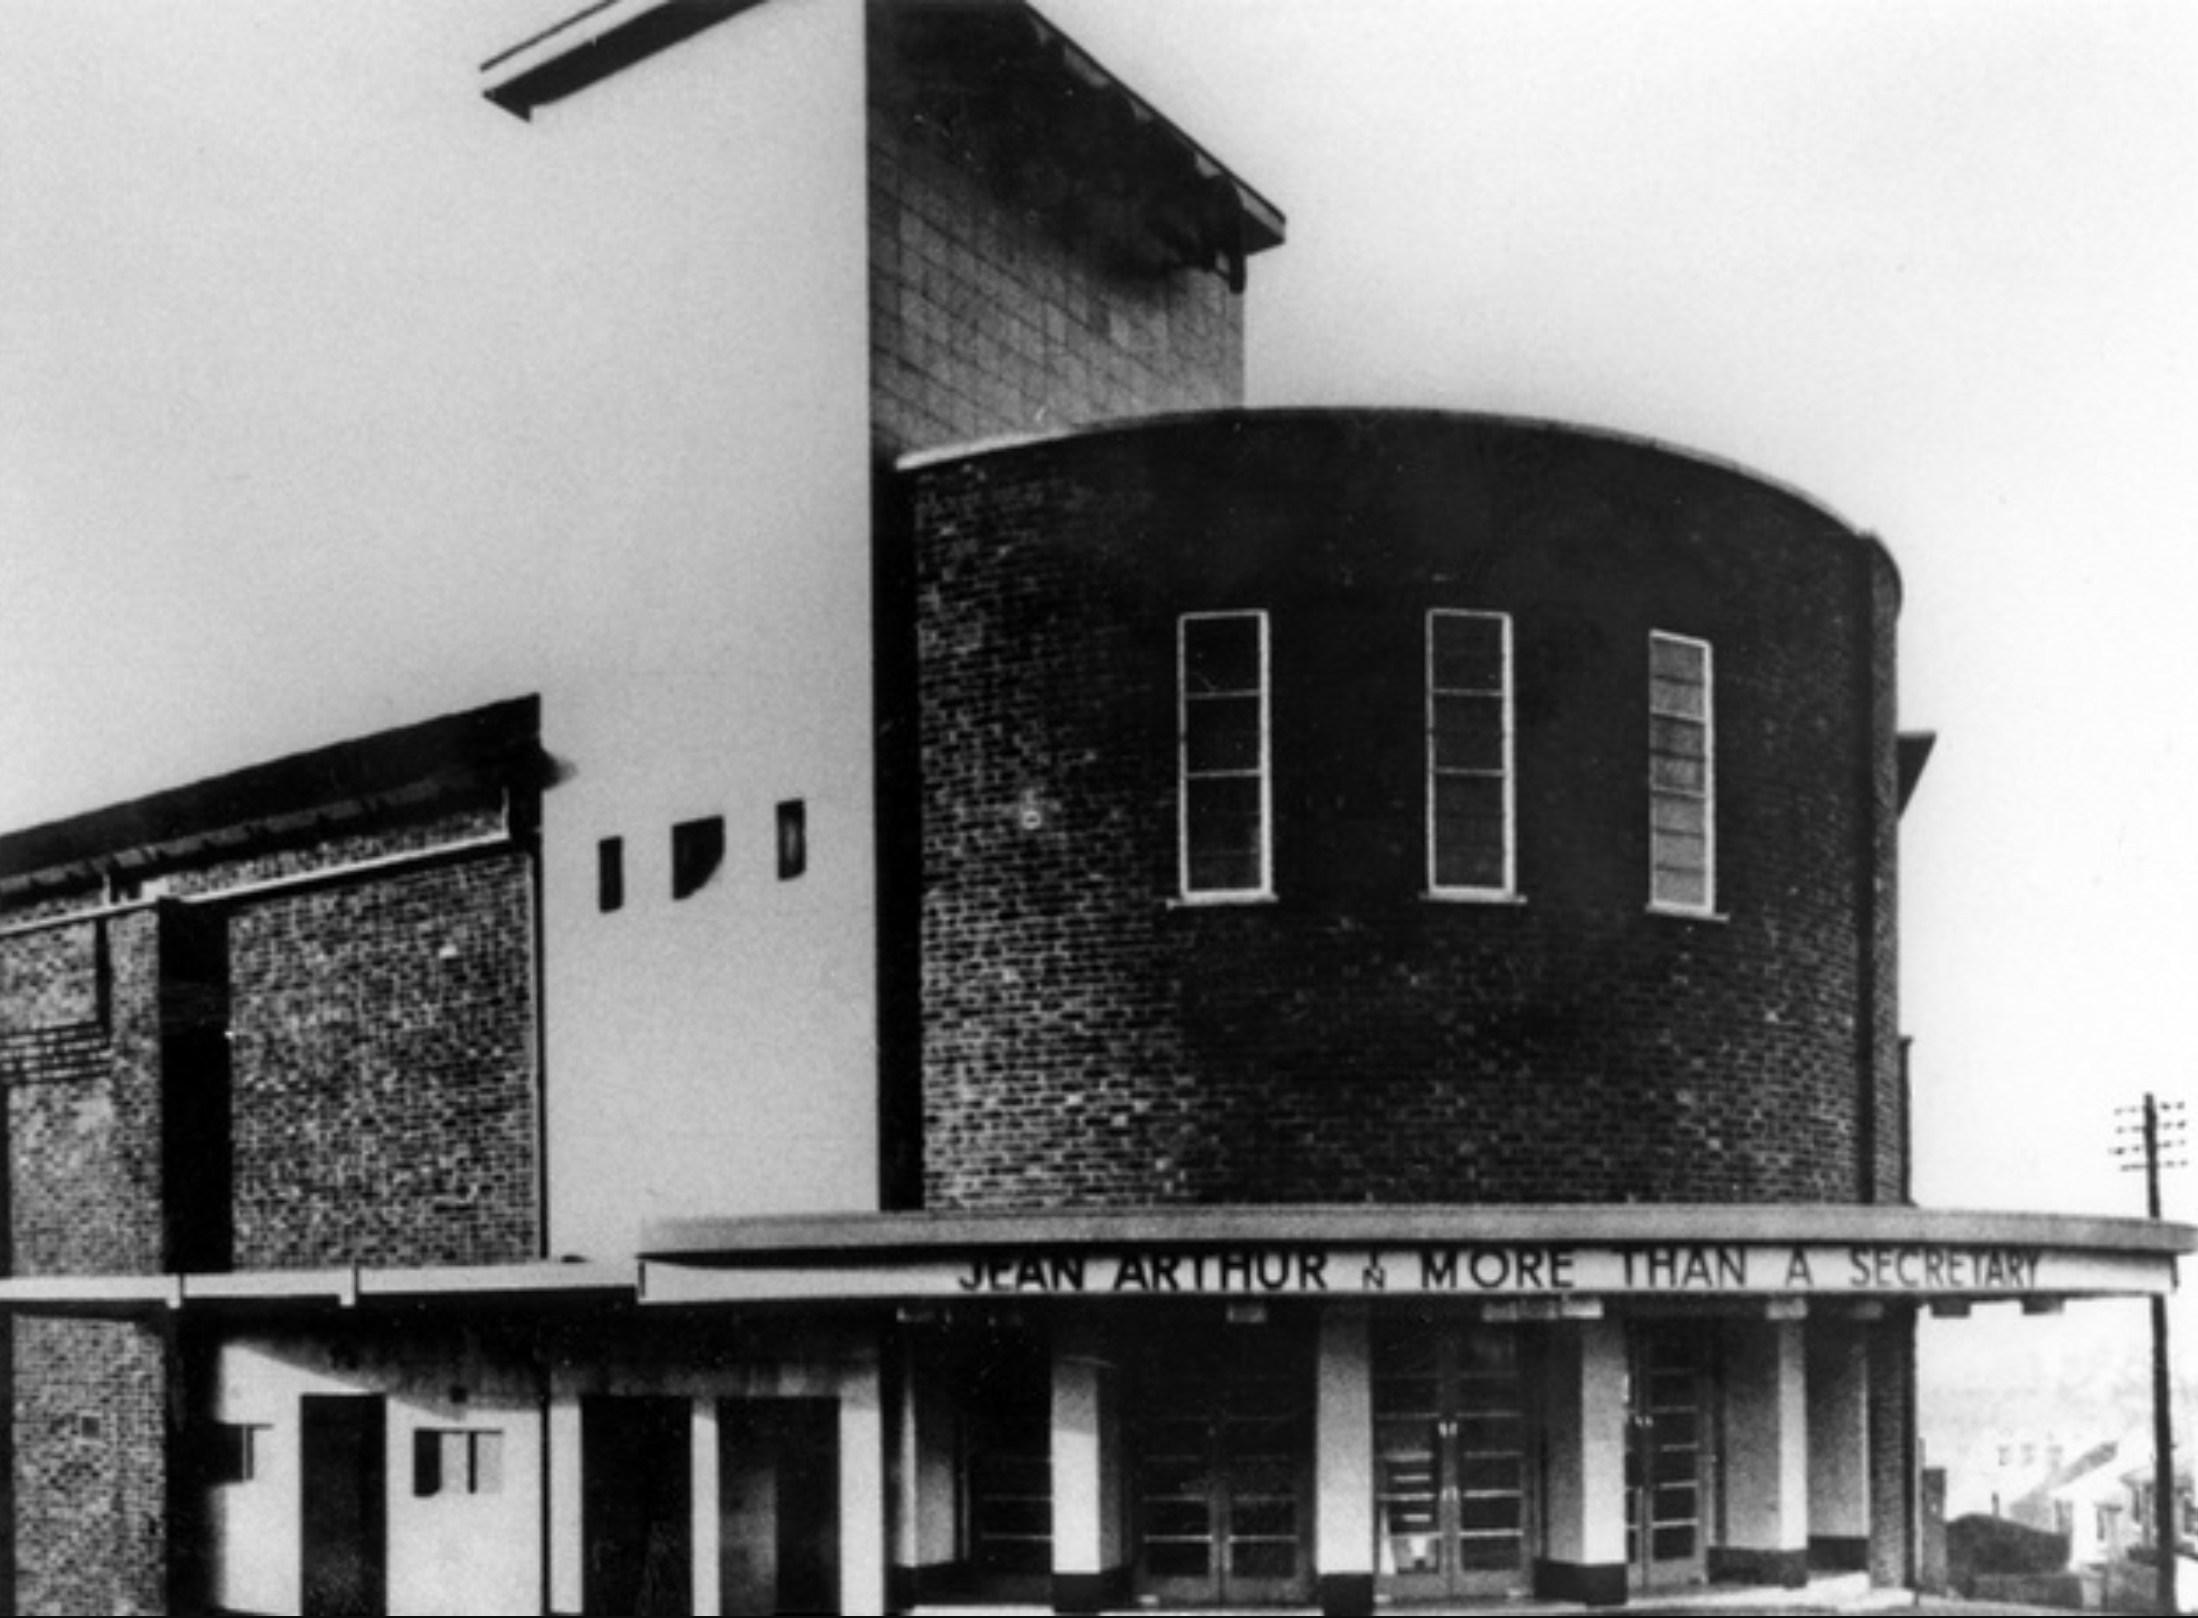 The Plaza Cinema, Handsworth